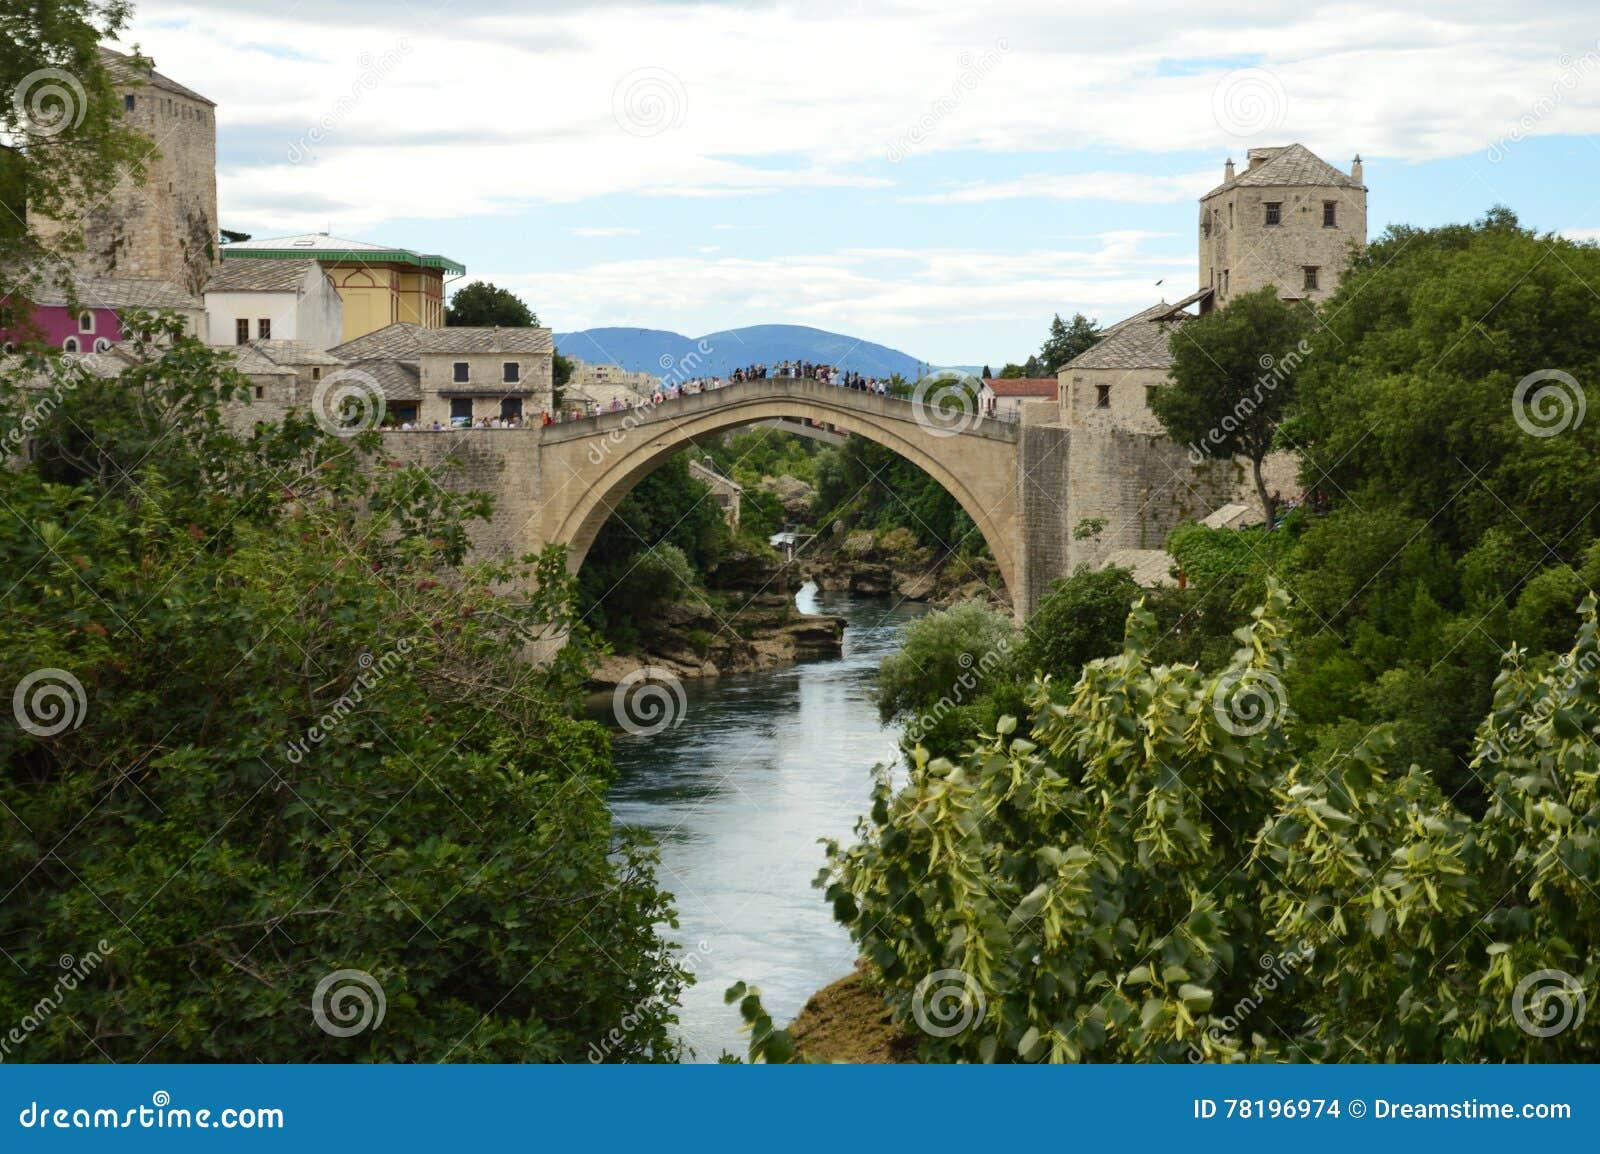 Mostar bridge in Bosnia and Herzegovina